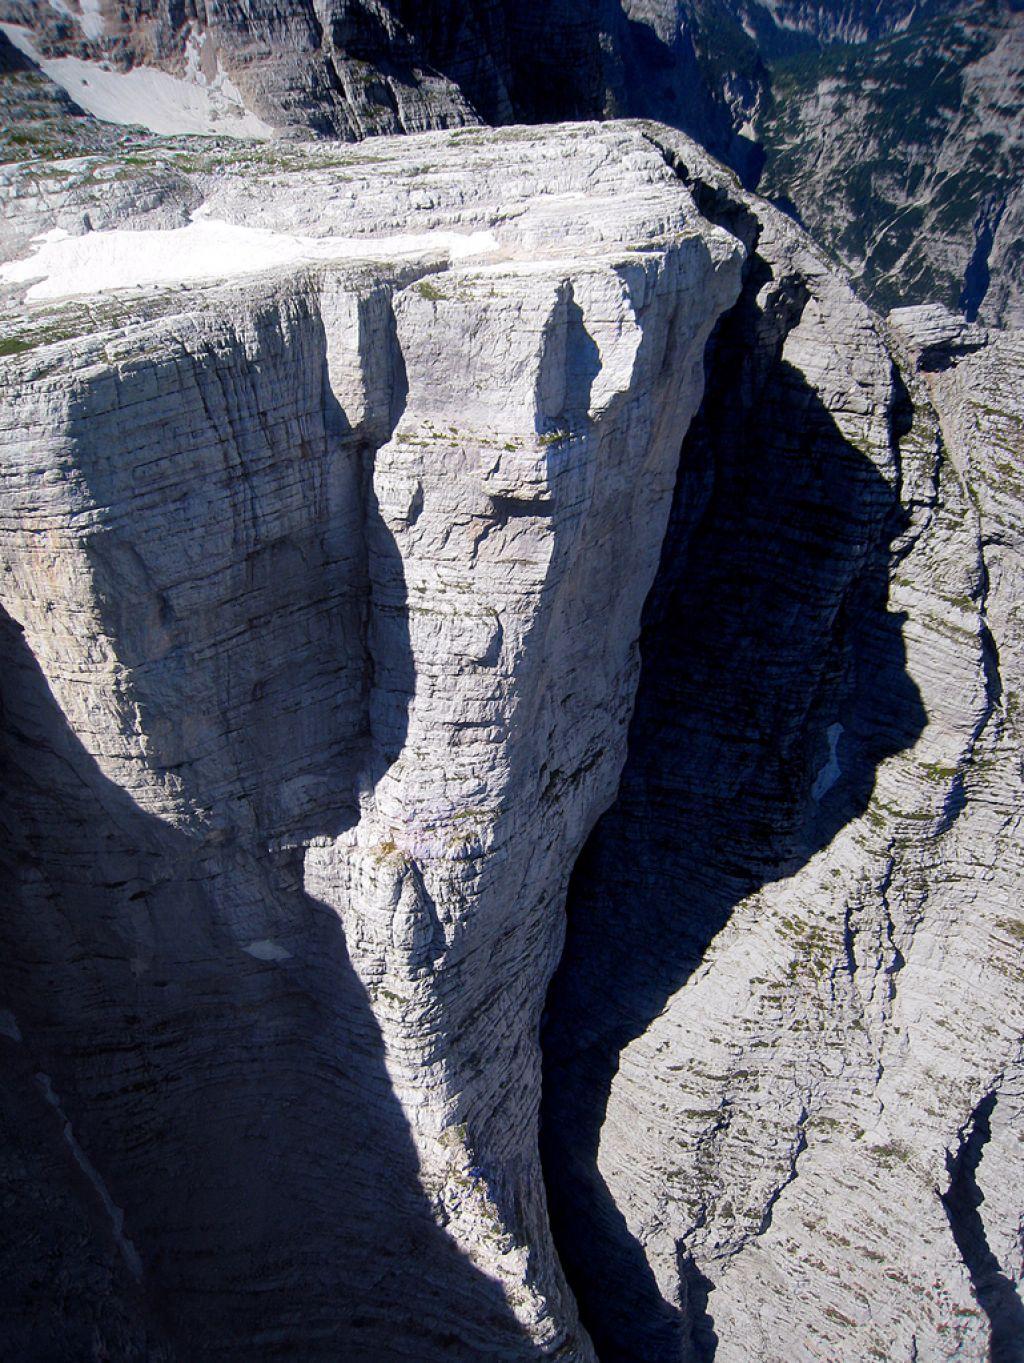 Ante Mahkota: Vsak alpinist ima svojo Sfingo